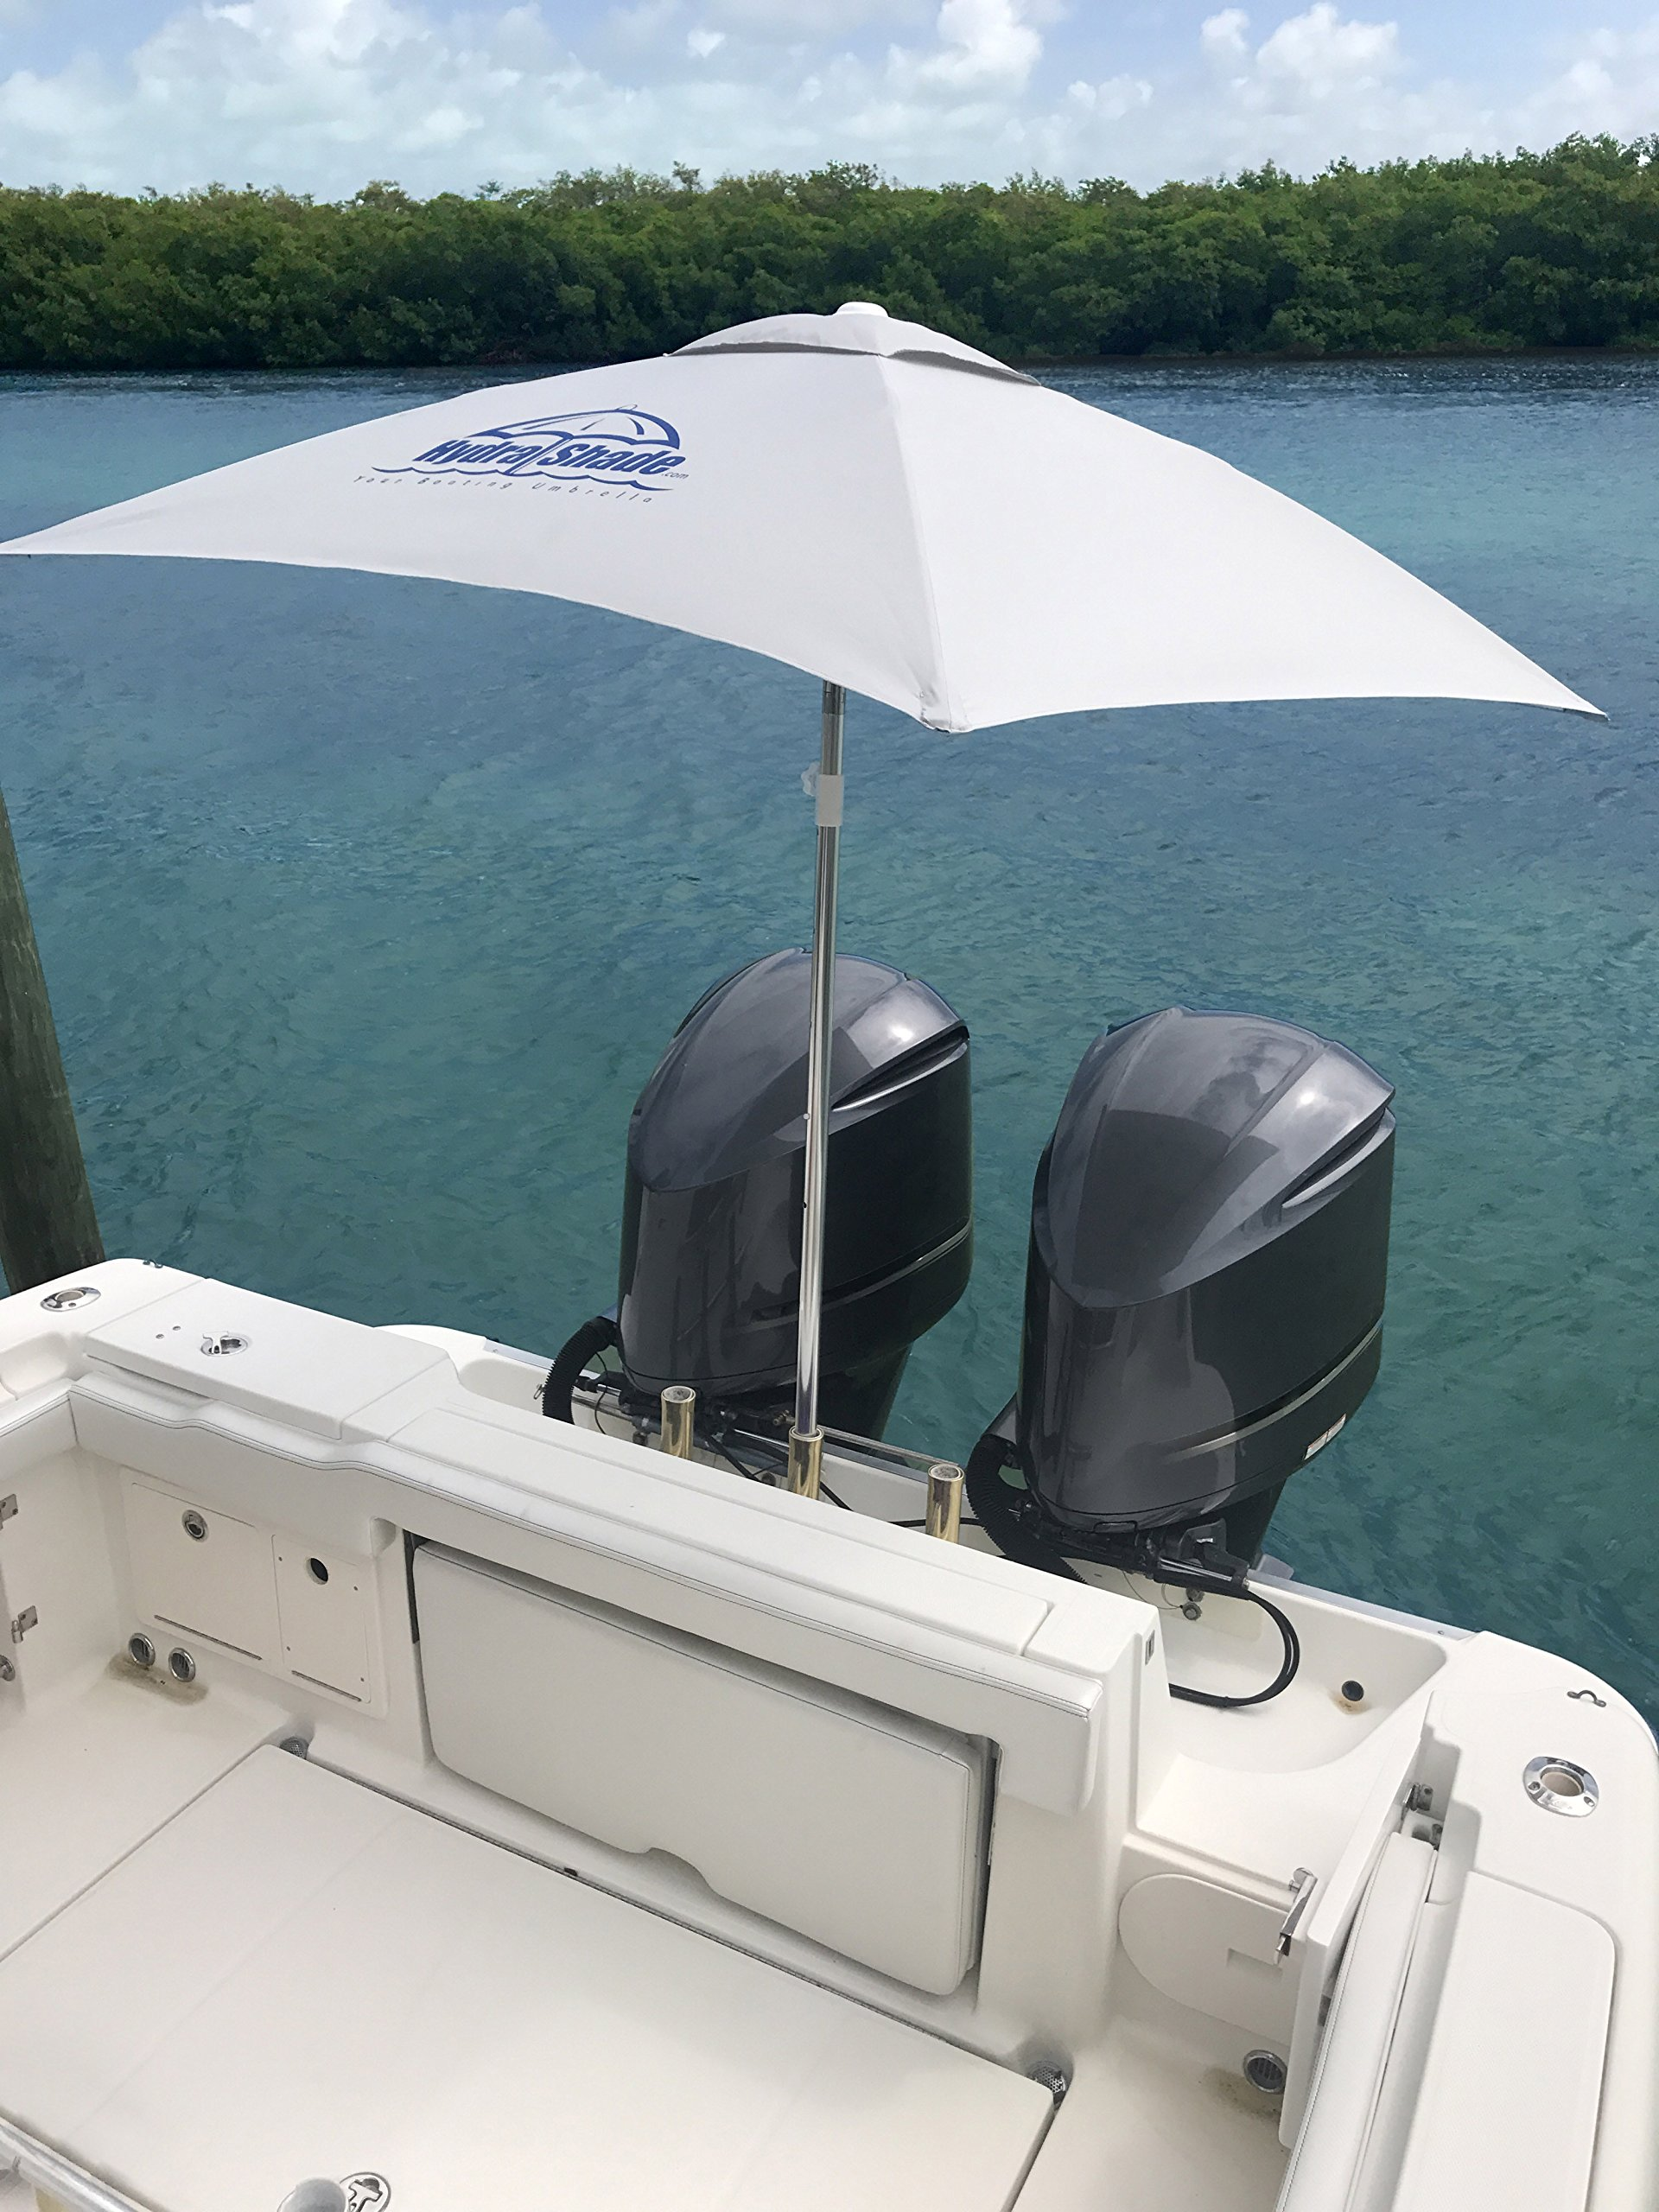 Hospitality Rattan XL-150 Hydra Shade 8' Square Boating & Beach Umbrella Kit, White by Hospitality Rattan (Image #4)